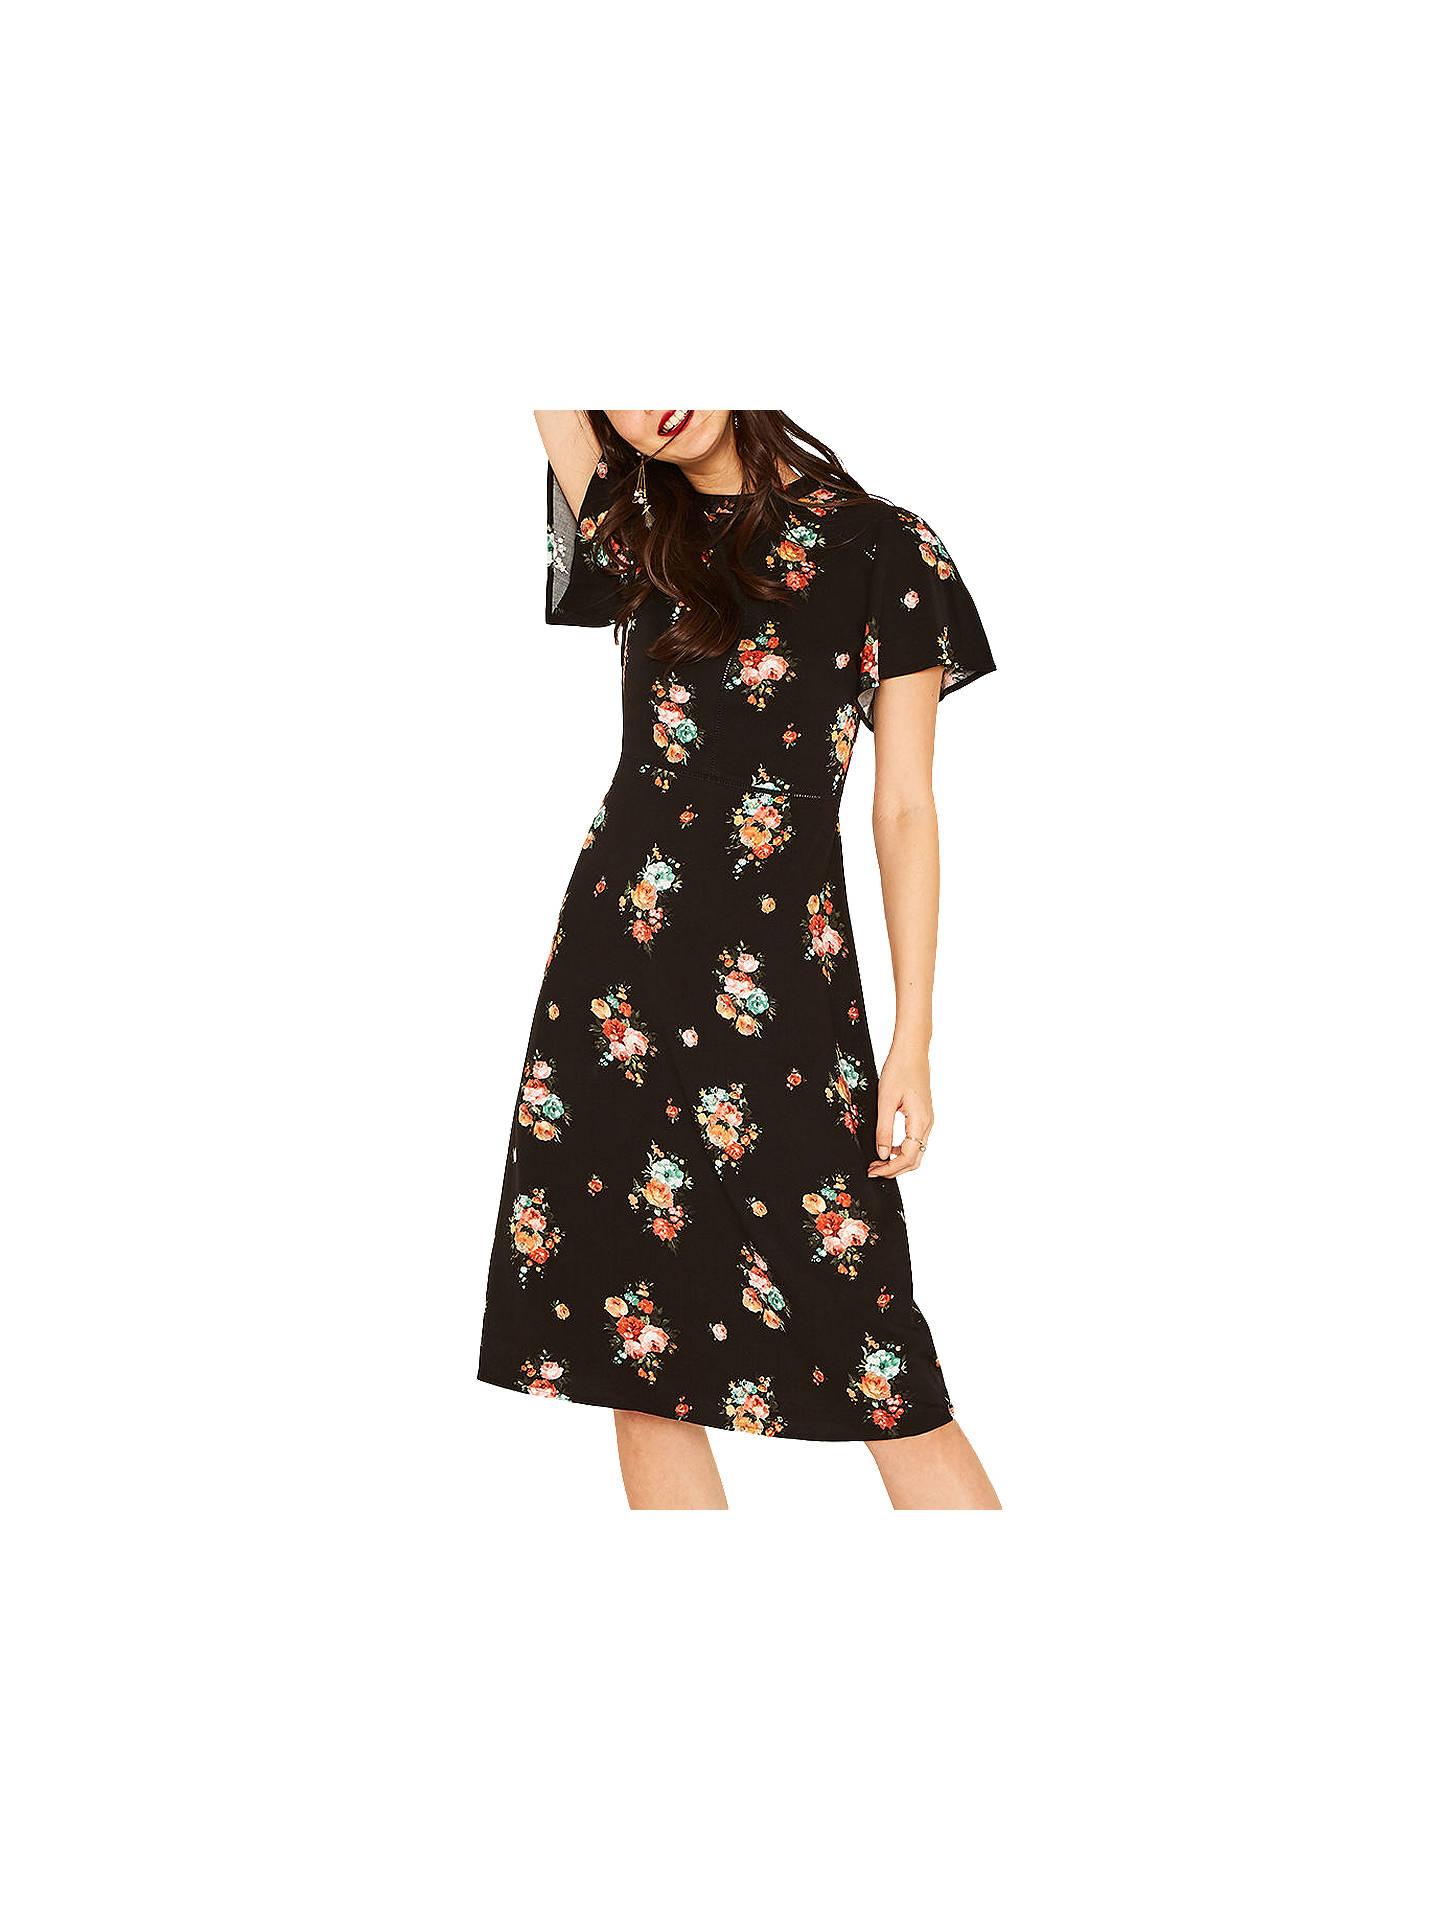 82fd258f4a7f Buy Oasis Angel Sleeve Bouquet Dress, Multi/Black, 6 Online at johnlewis.